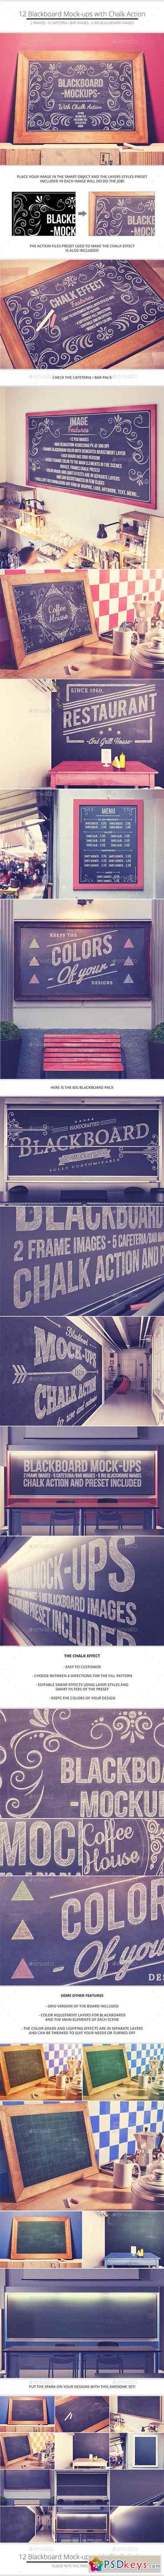 Blackboard Chalkboard Mock-ups with Chalk Action 10799470